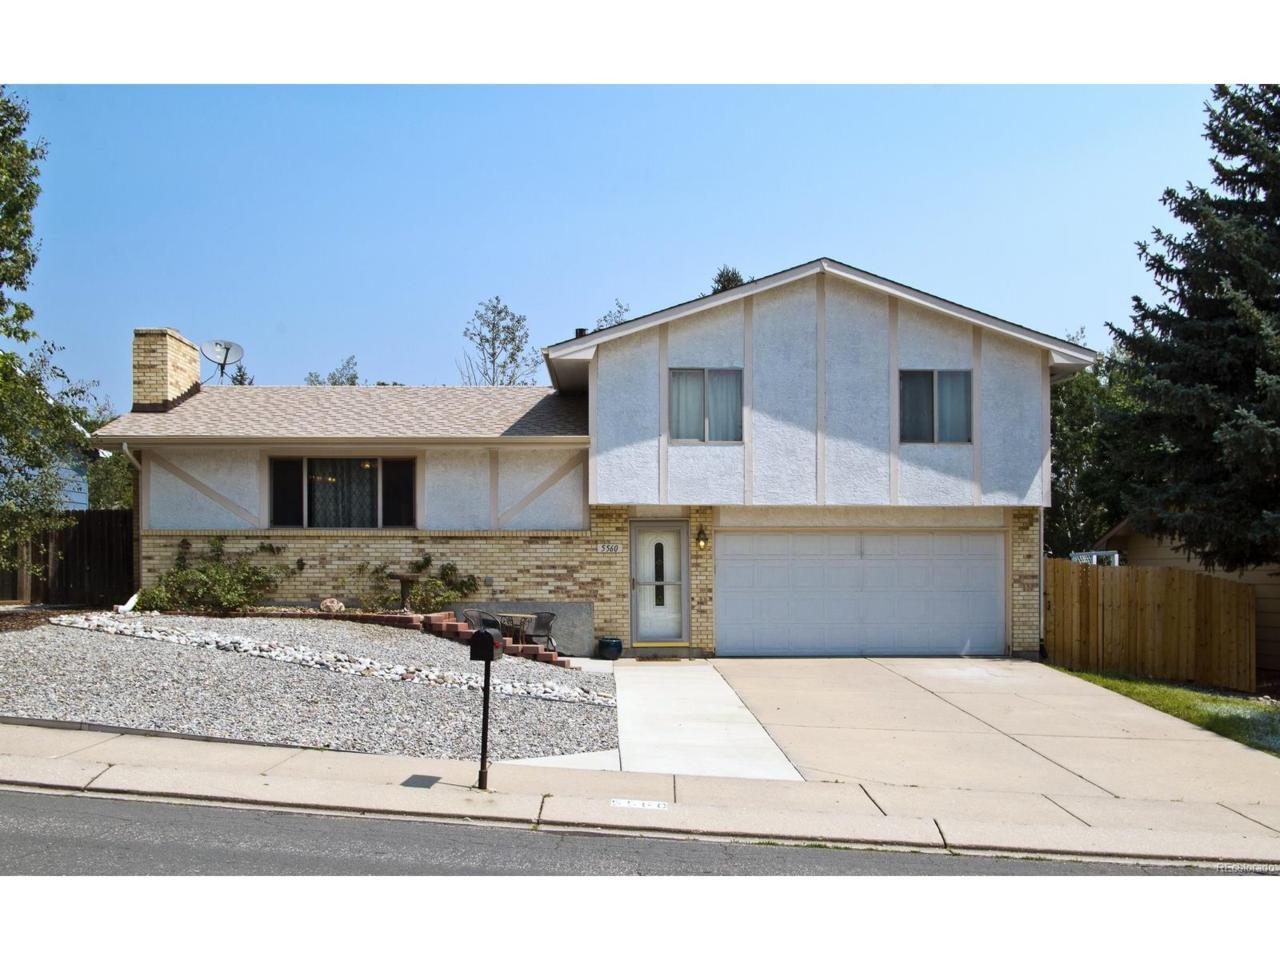 5560 Whimsical Drive, Colorado Springs, CO 80917 (MLS #1806562) :: 8z Real Estate